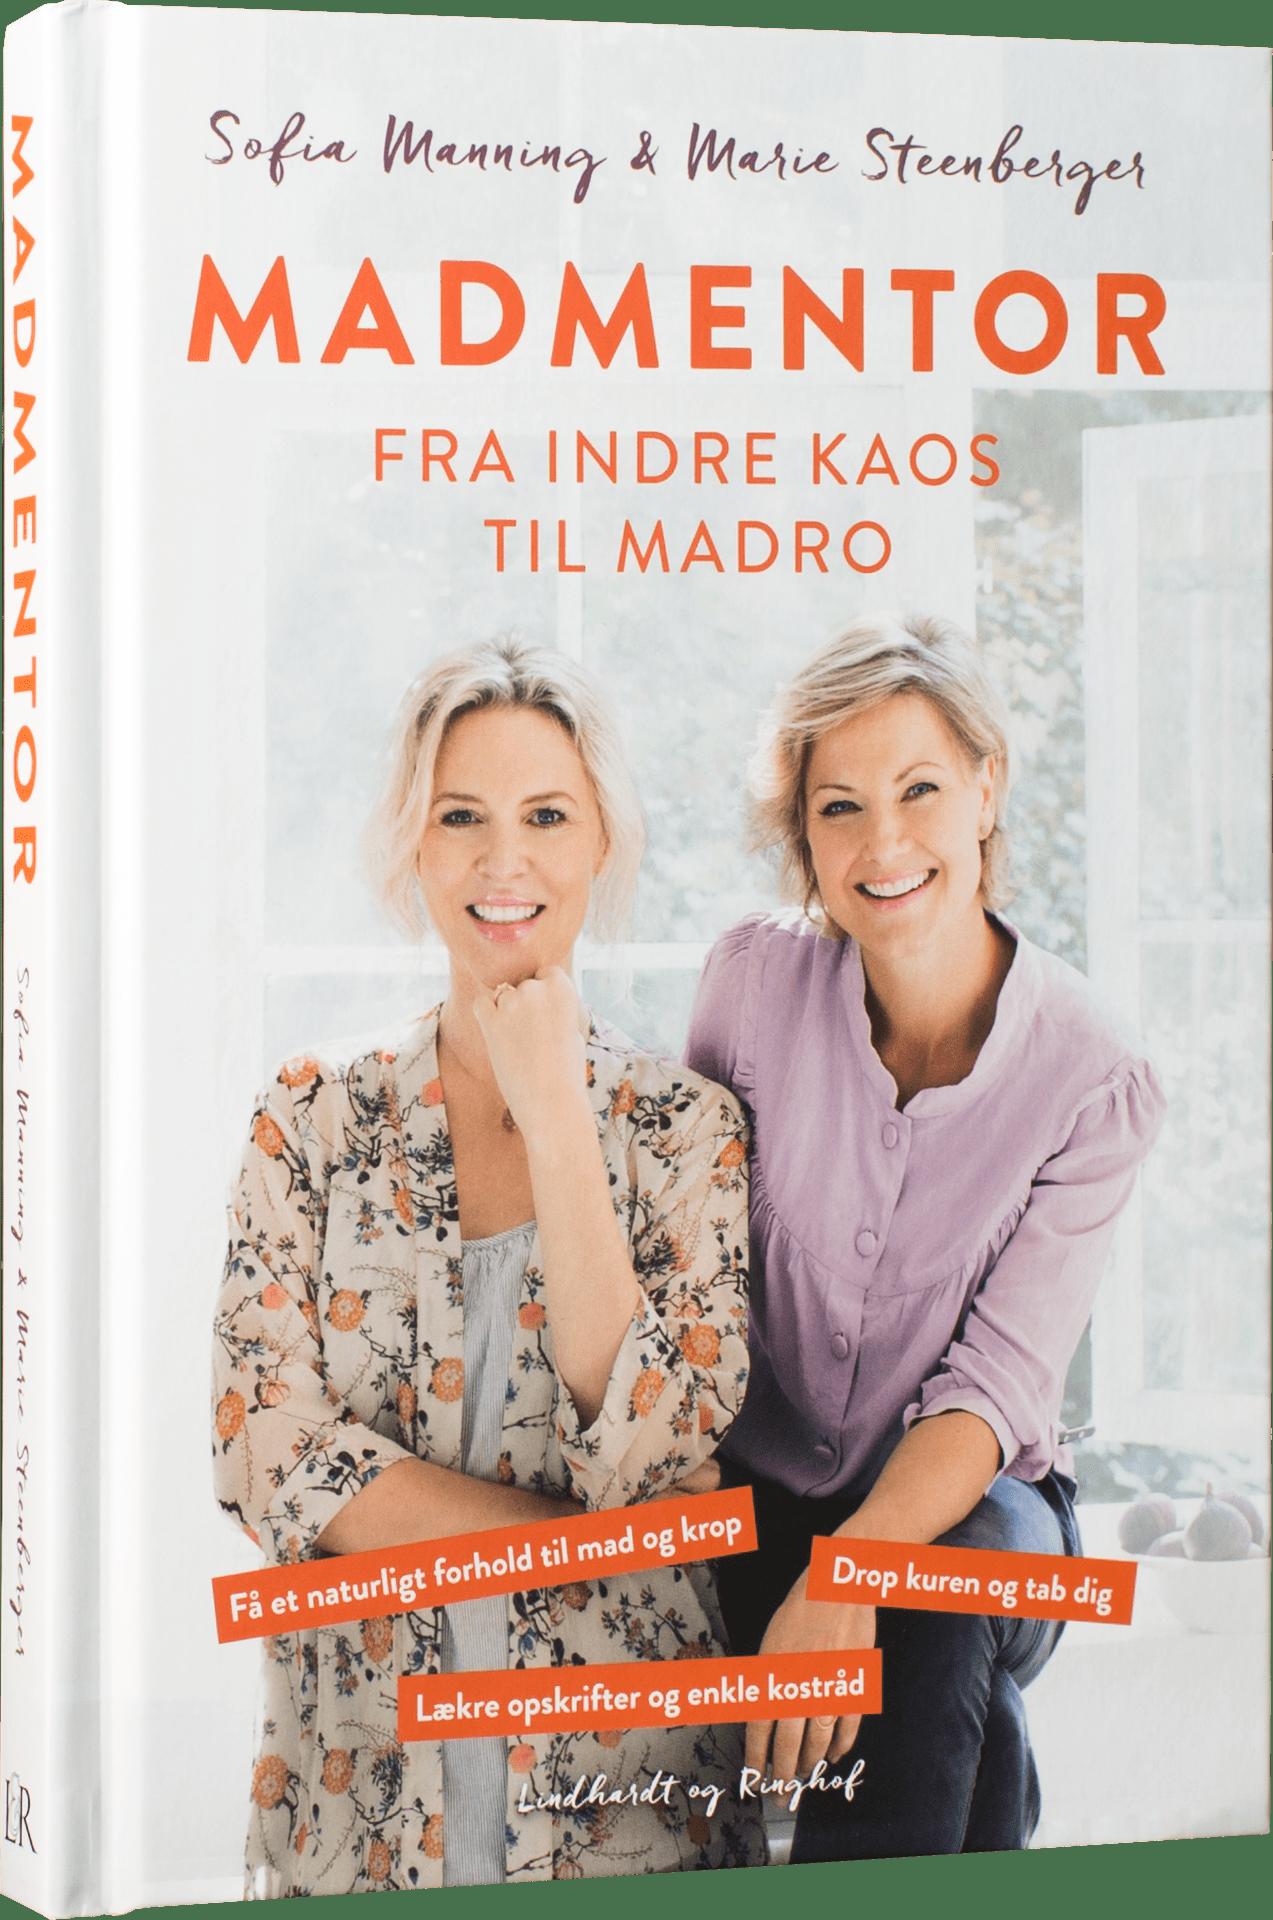 madmentor, opskrift, sund mad, sunde opskrifter, sund opskrift, Sofia Manning, Marie Steenberger